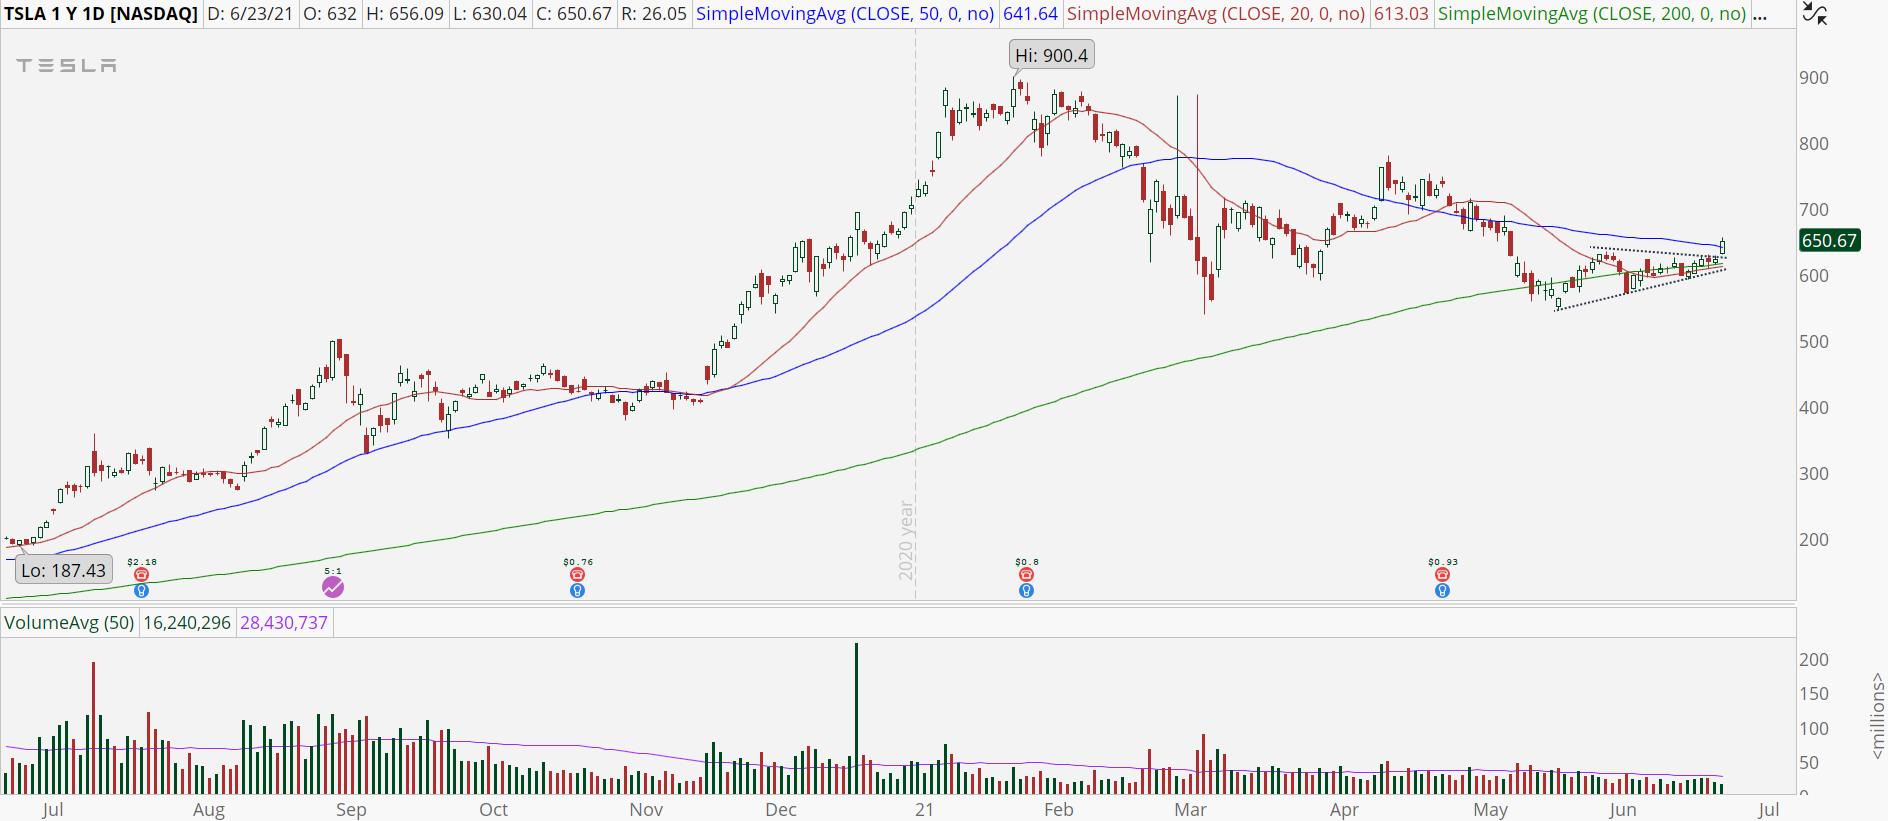 Tesla (TSLA) stock chart with triangle breakout